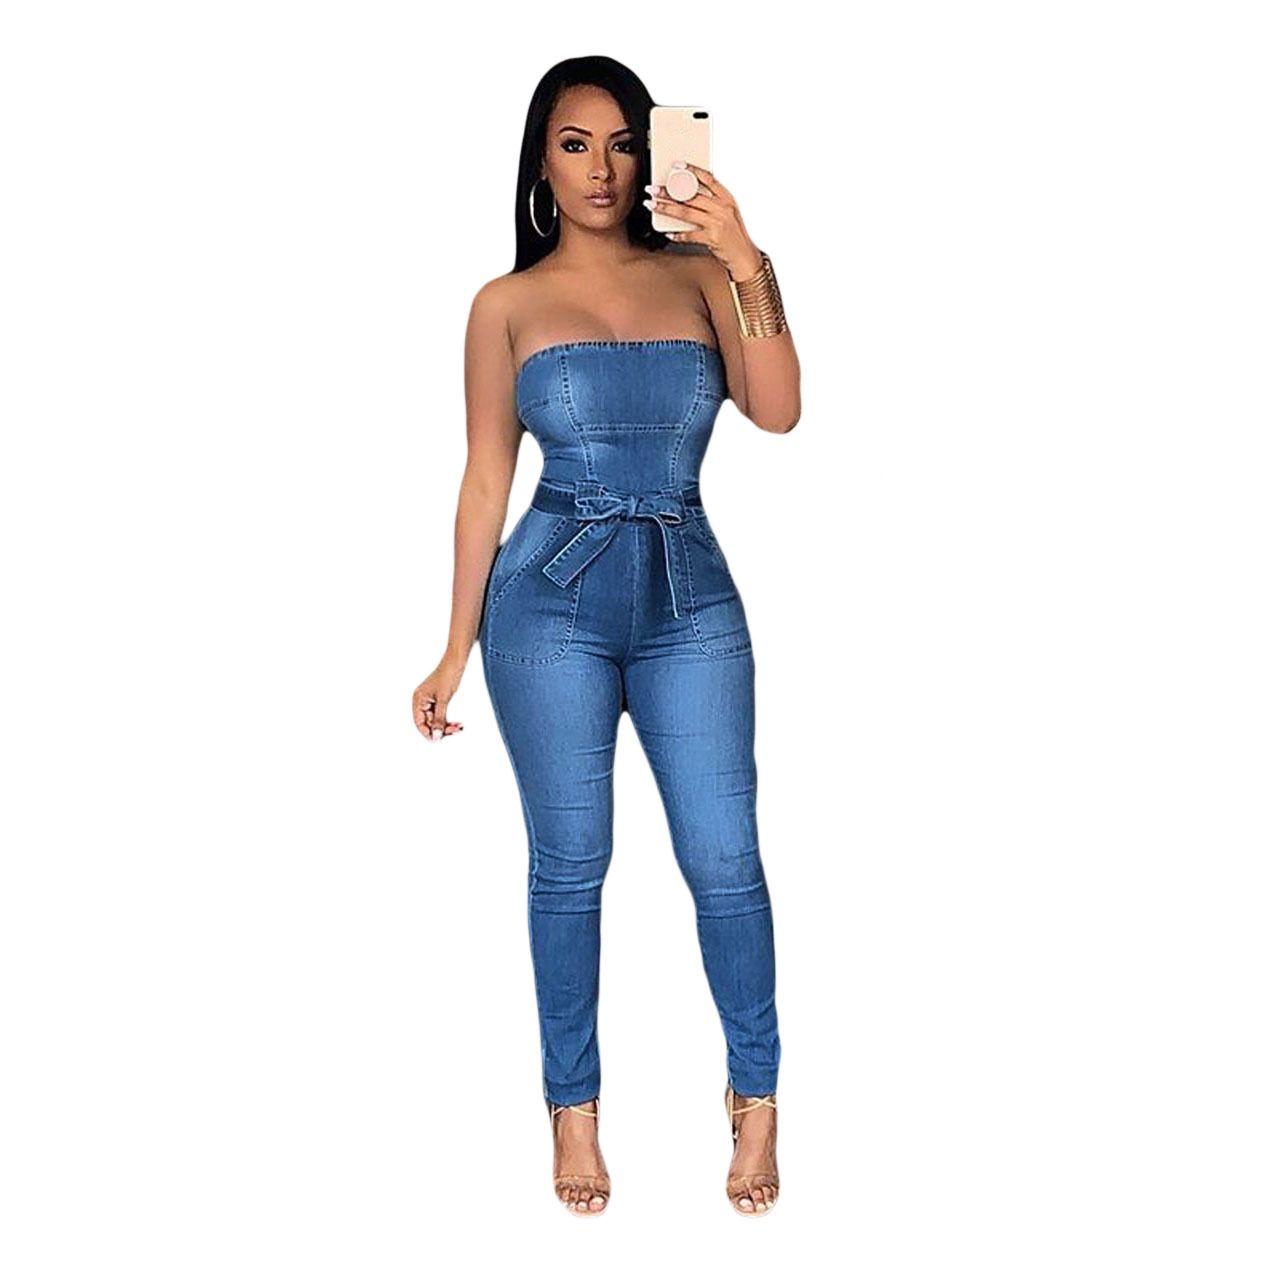 a851c9a0d49 2019 2018 Fashion Women Jumpsuits Slim Casual Solid Denim Jumpsuit Female  Long Pant Jumpsuit Strapless Bodycon Romper Overalls From Qingyun1996